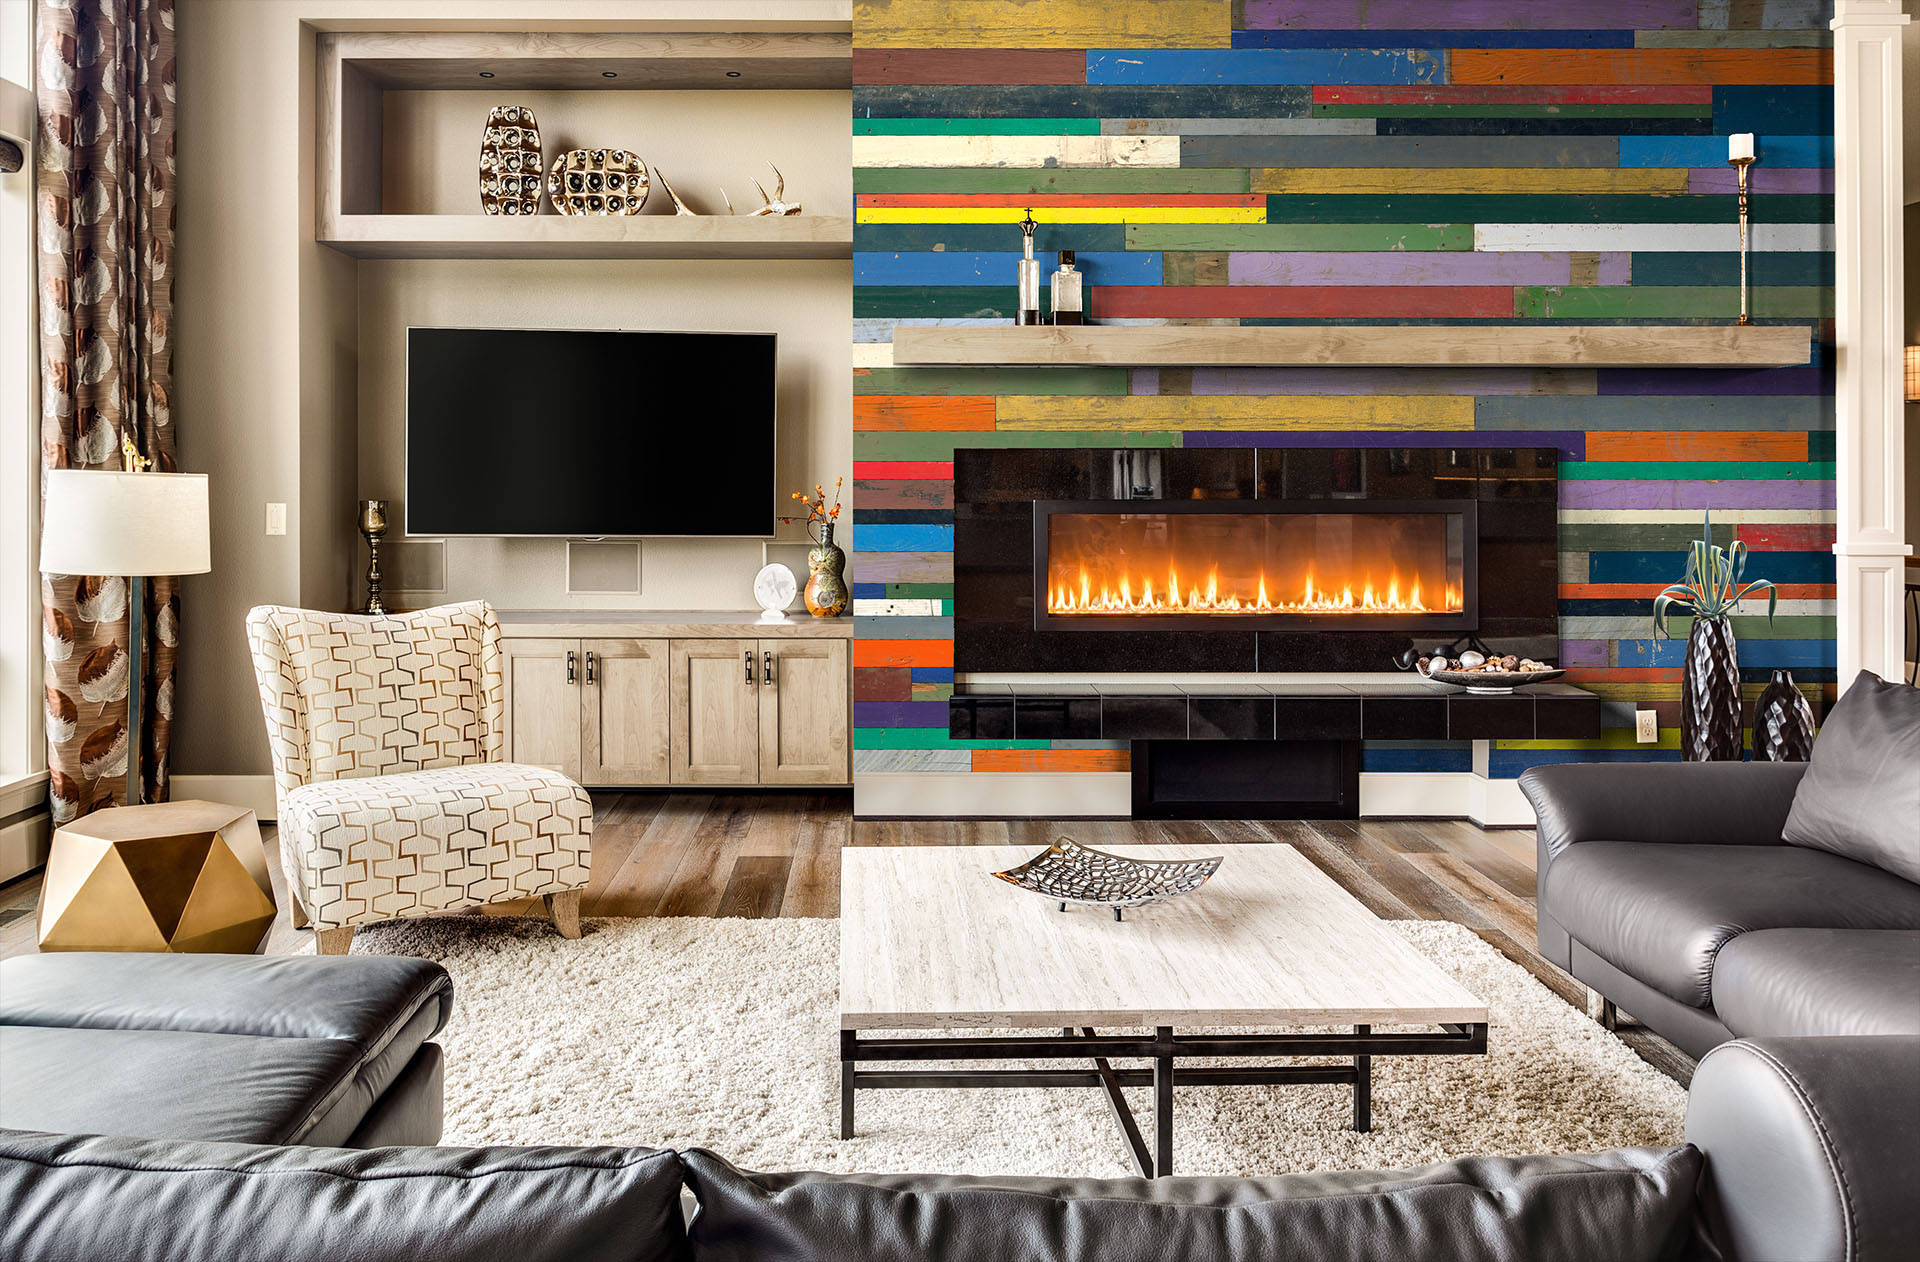 Berühmt Holz Wandverkleidung aus für Zuhause, Hotels oder Geschäfte ZX43